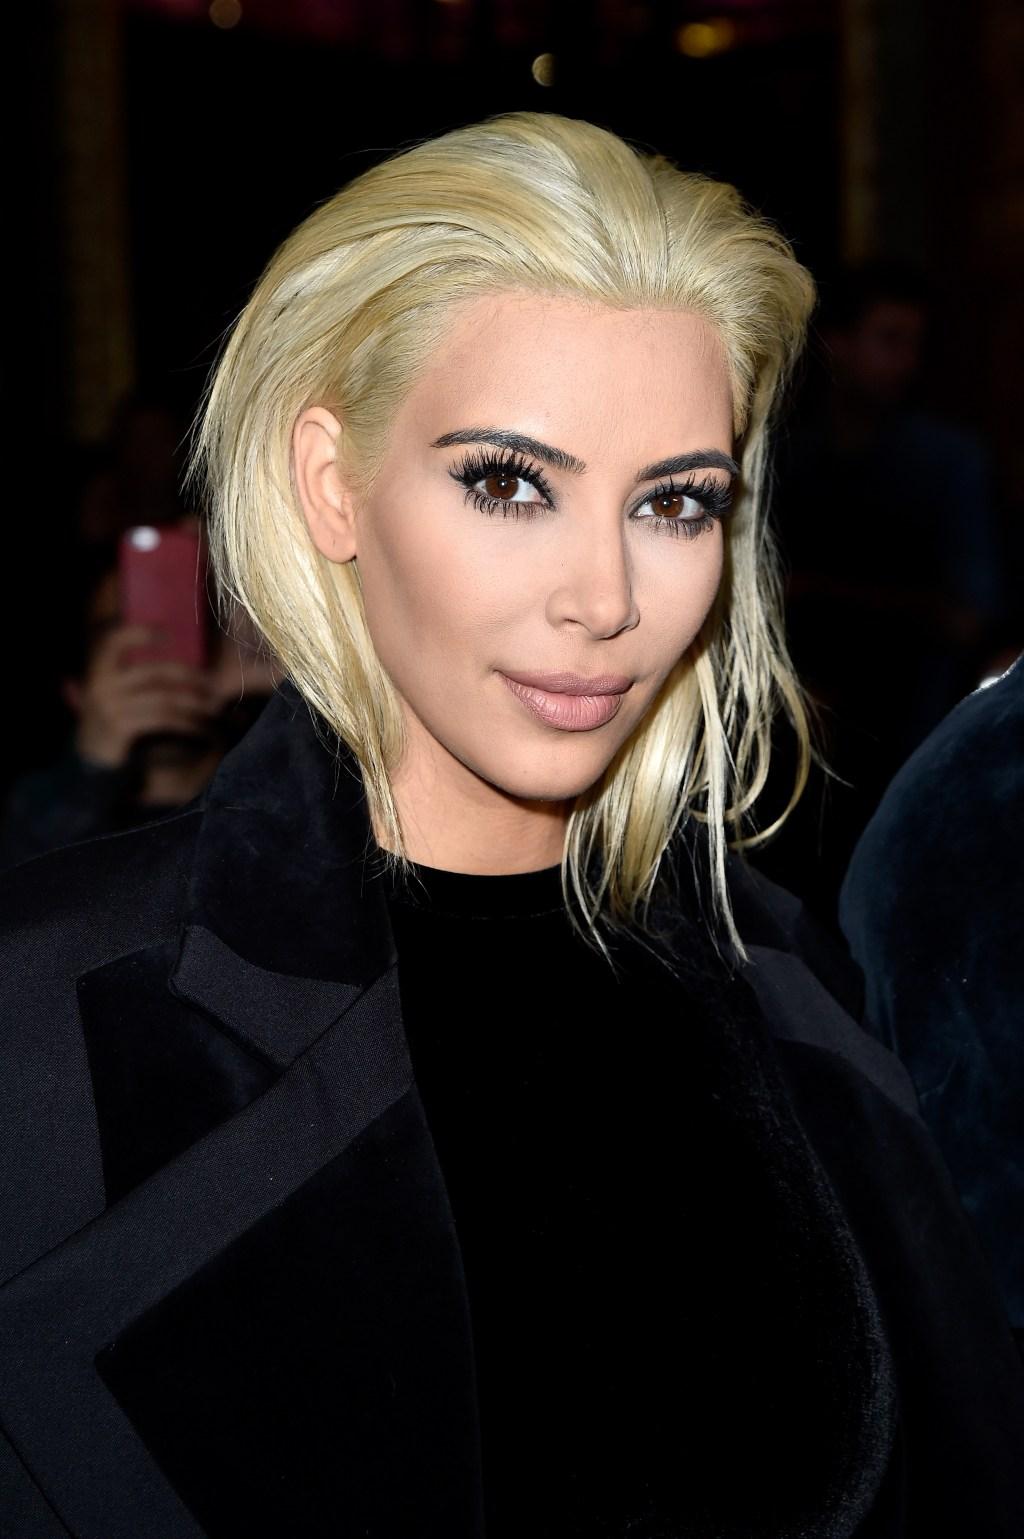 Kim Kardashian Balmain Paris Fashion Week 2015